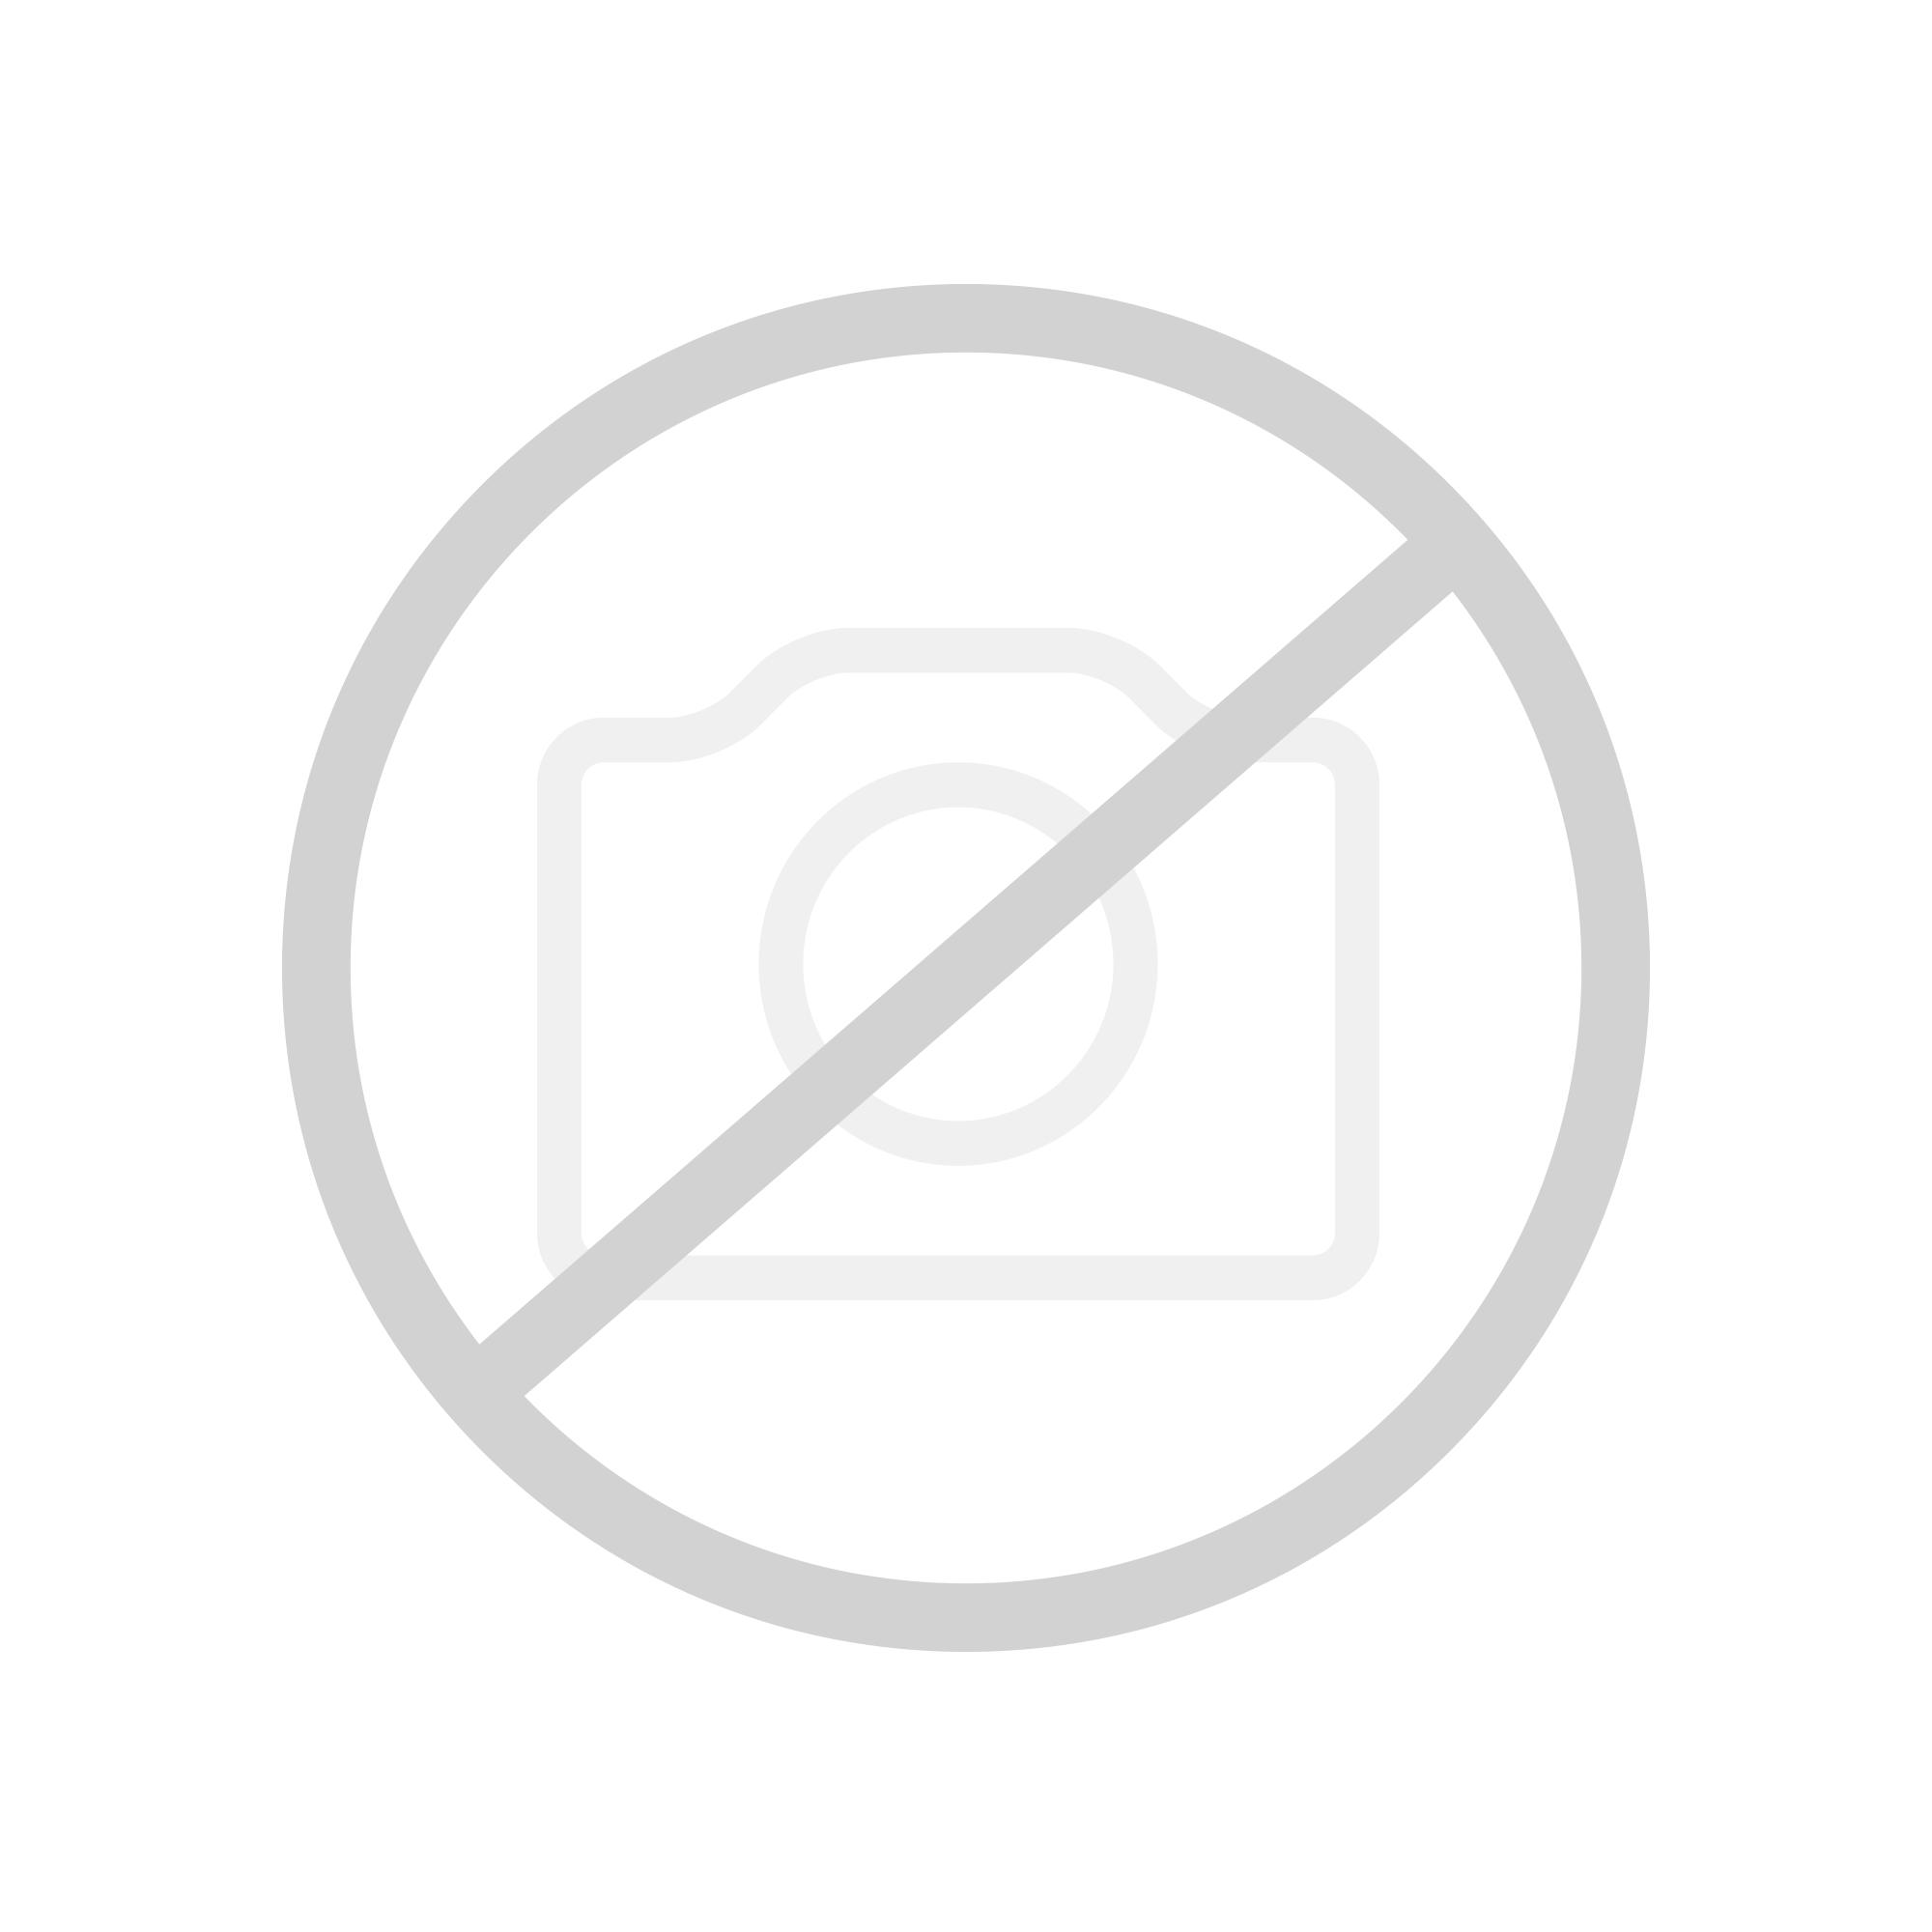 Hansgrohe Axor Citterio Semi-Pro Einhebel Küchenarmatur chrom